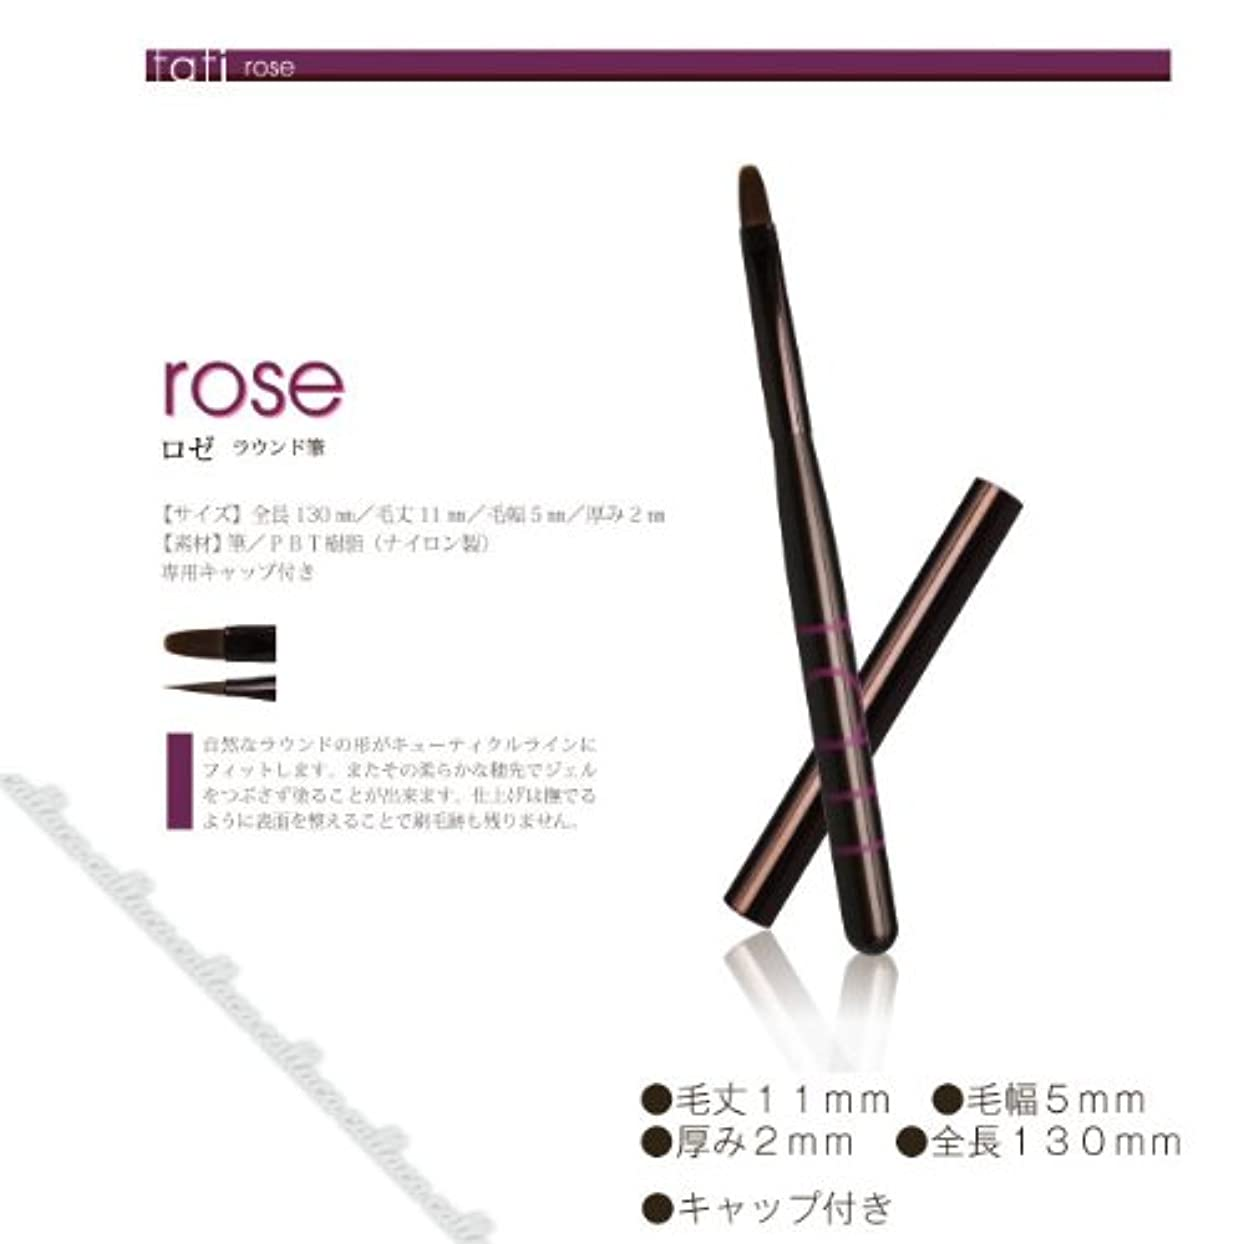 tati ジェル ブラシアートショコラ rose (ロゼ)